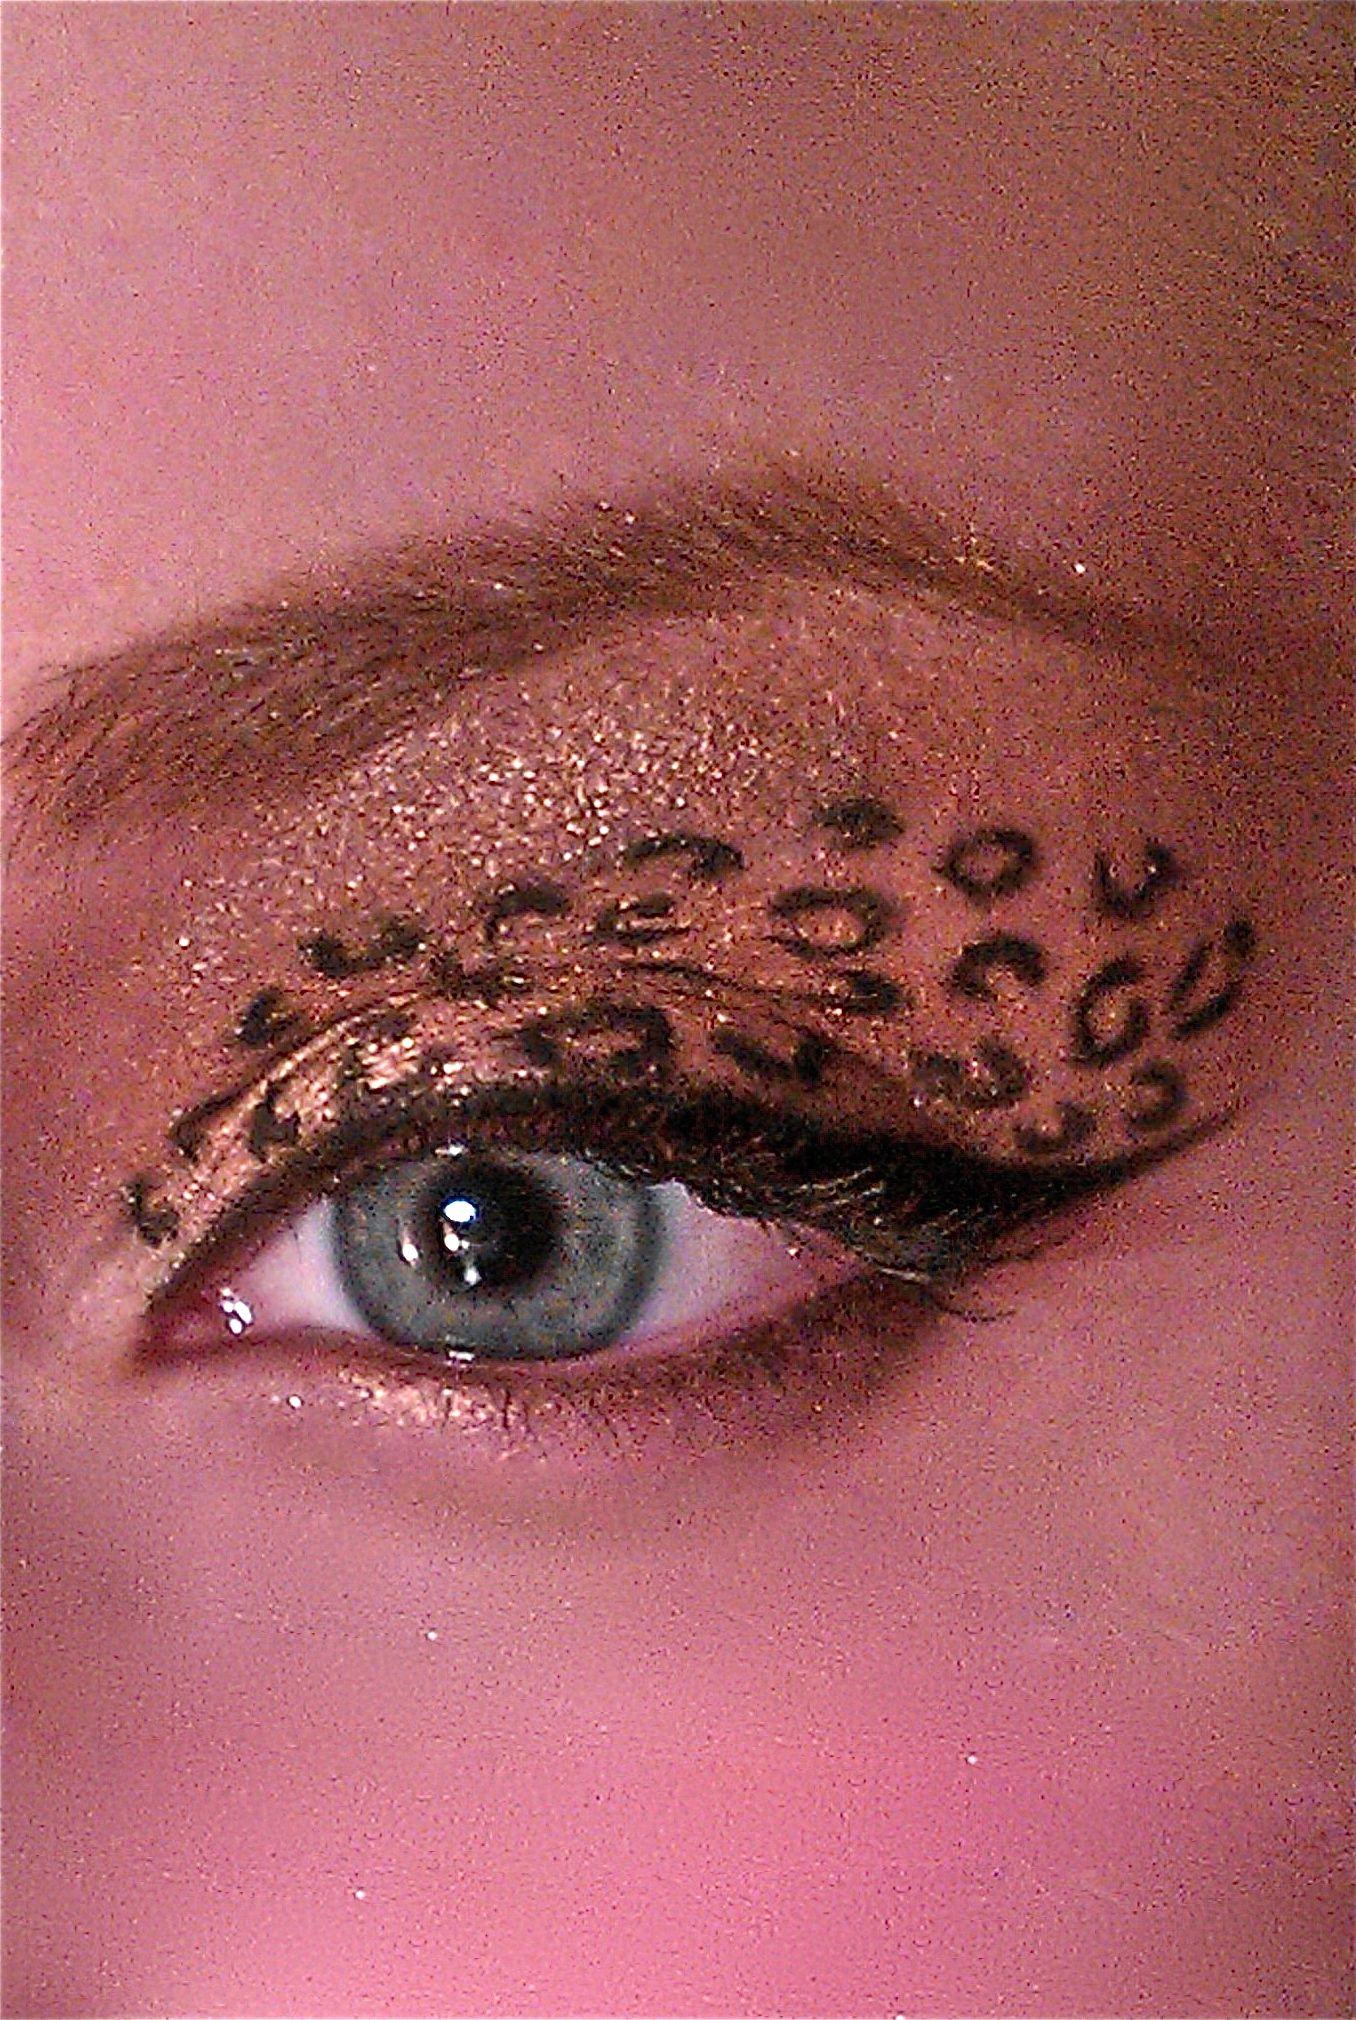 Cheetah Print I Did On Myself Some Folks Take It Too Damn Far